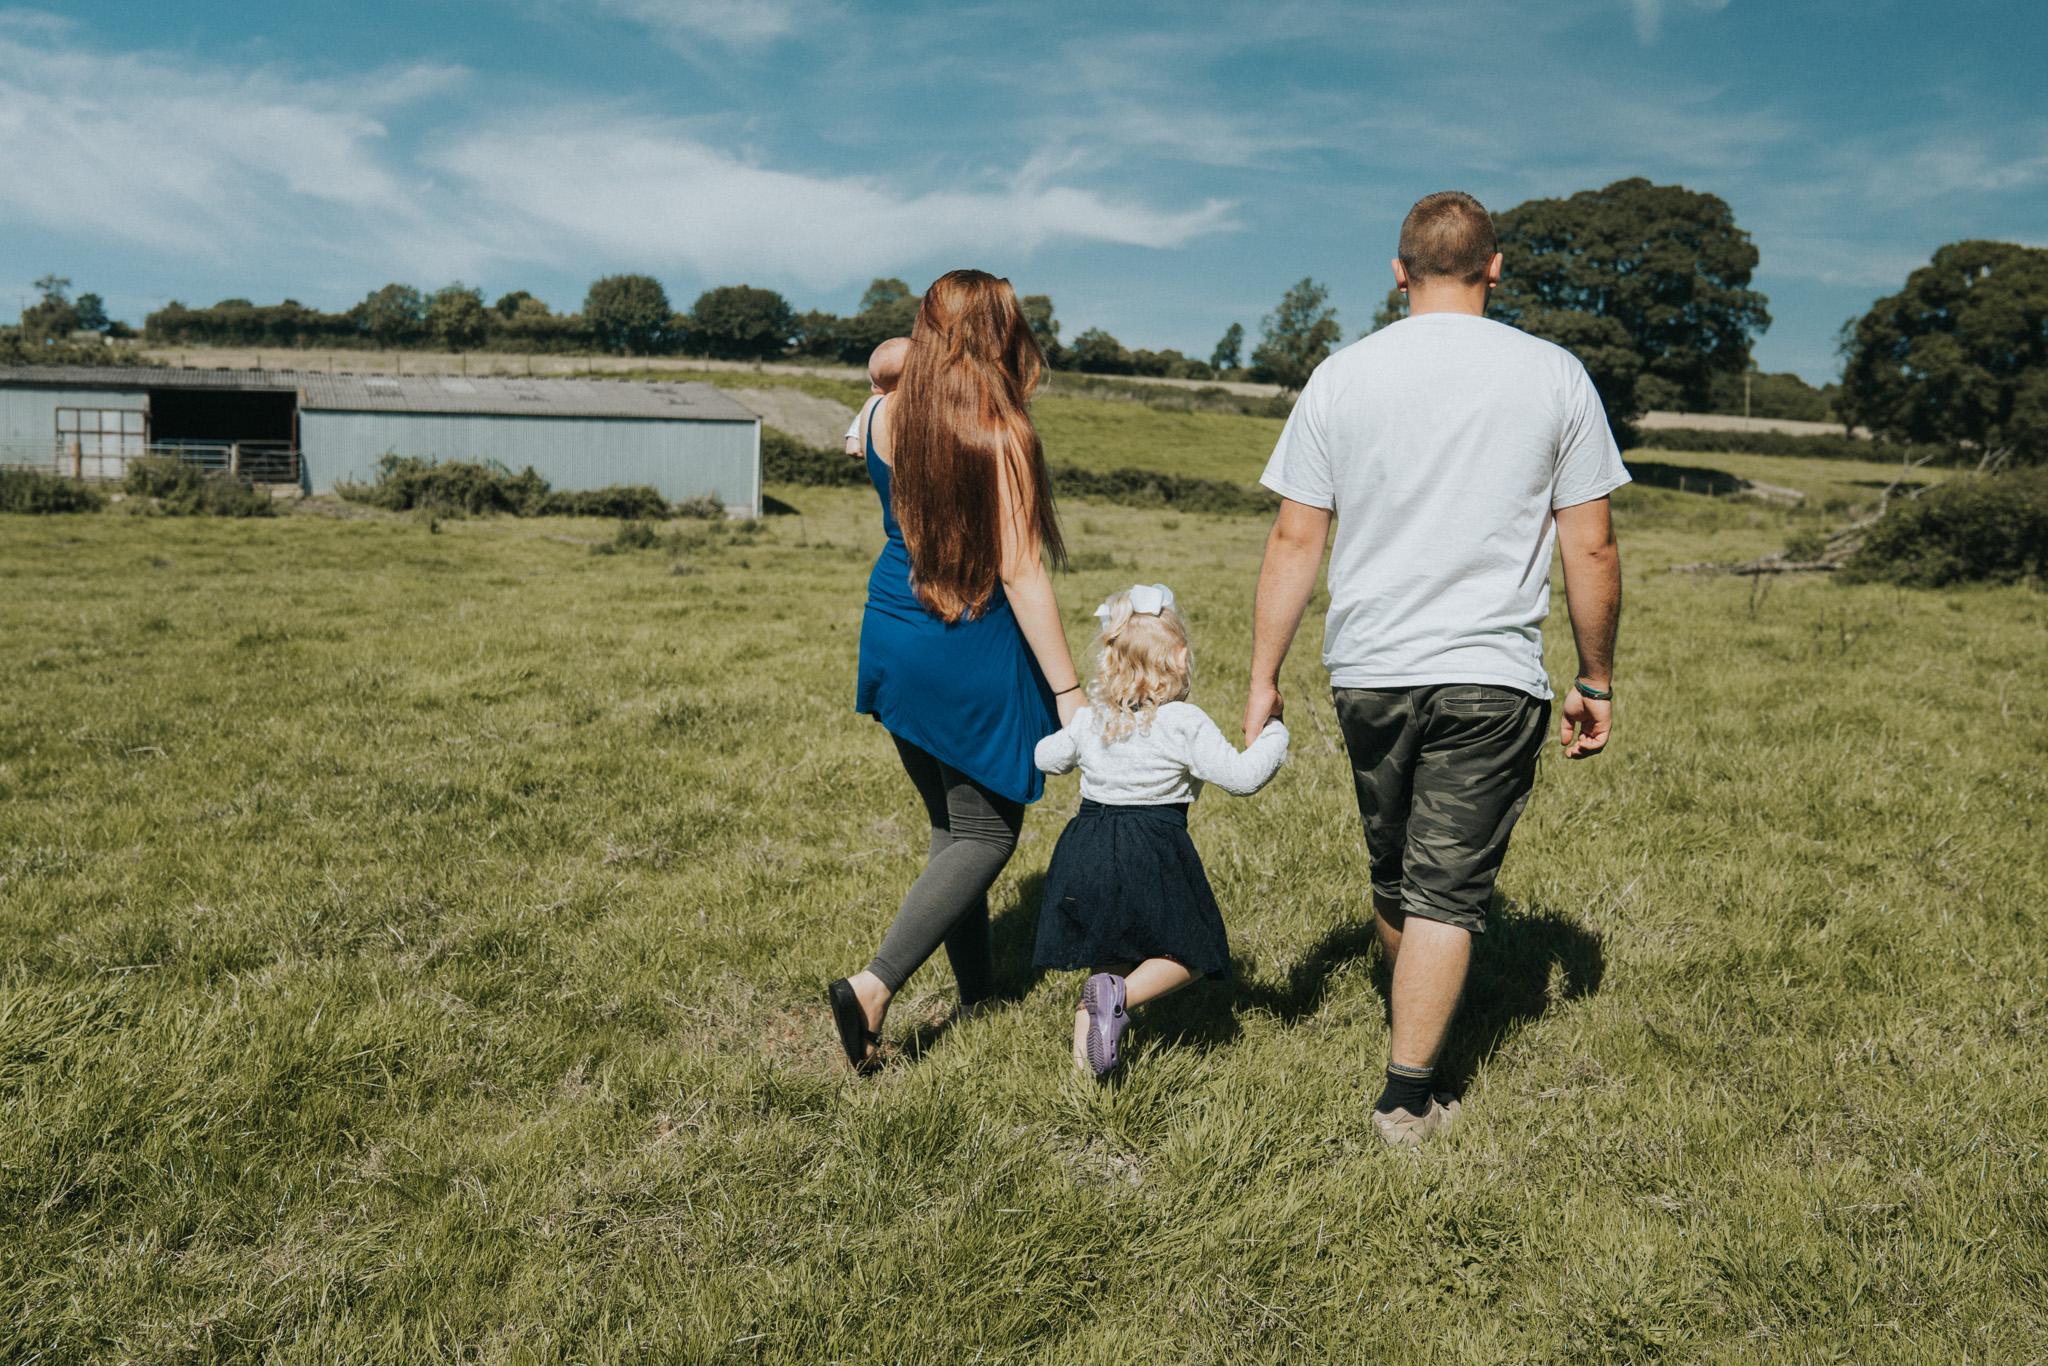 Family session on location, family walking through North Devon farm field